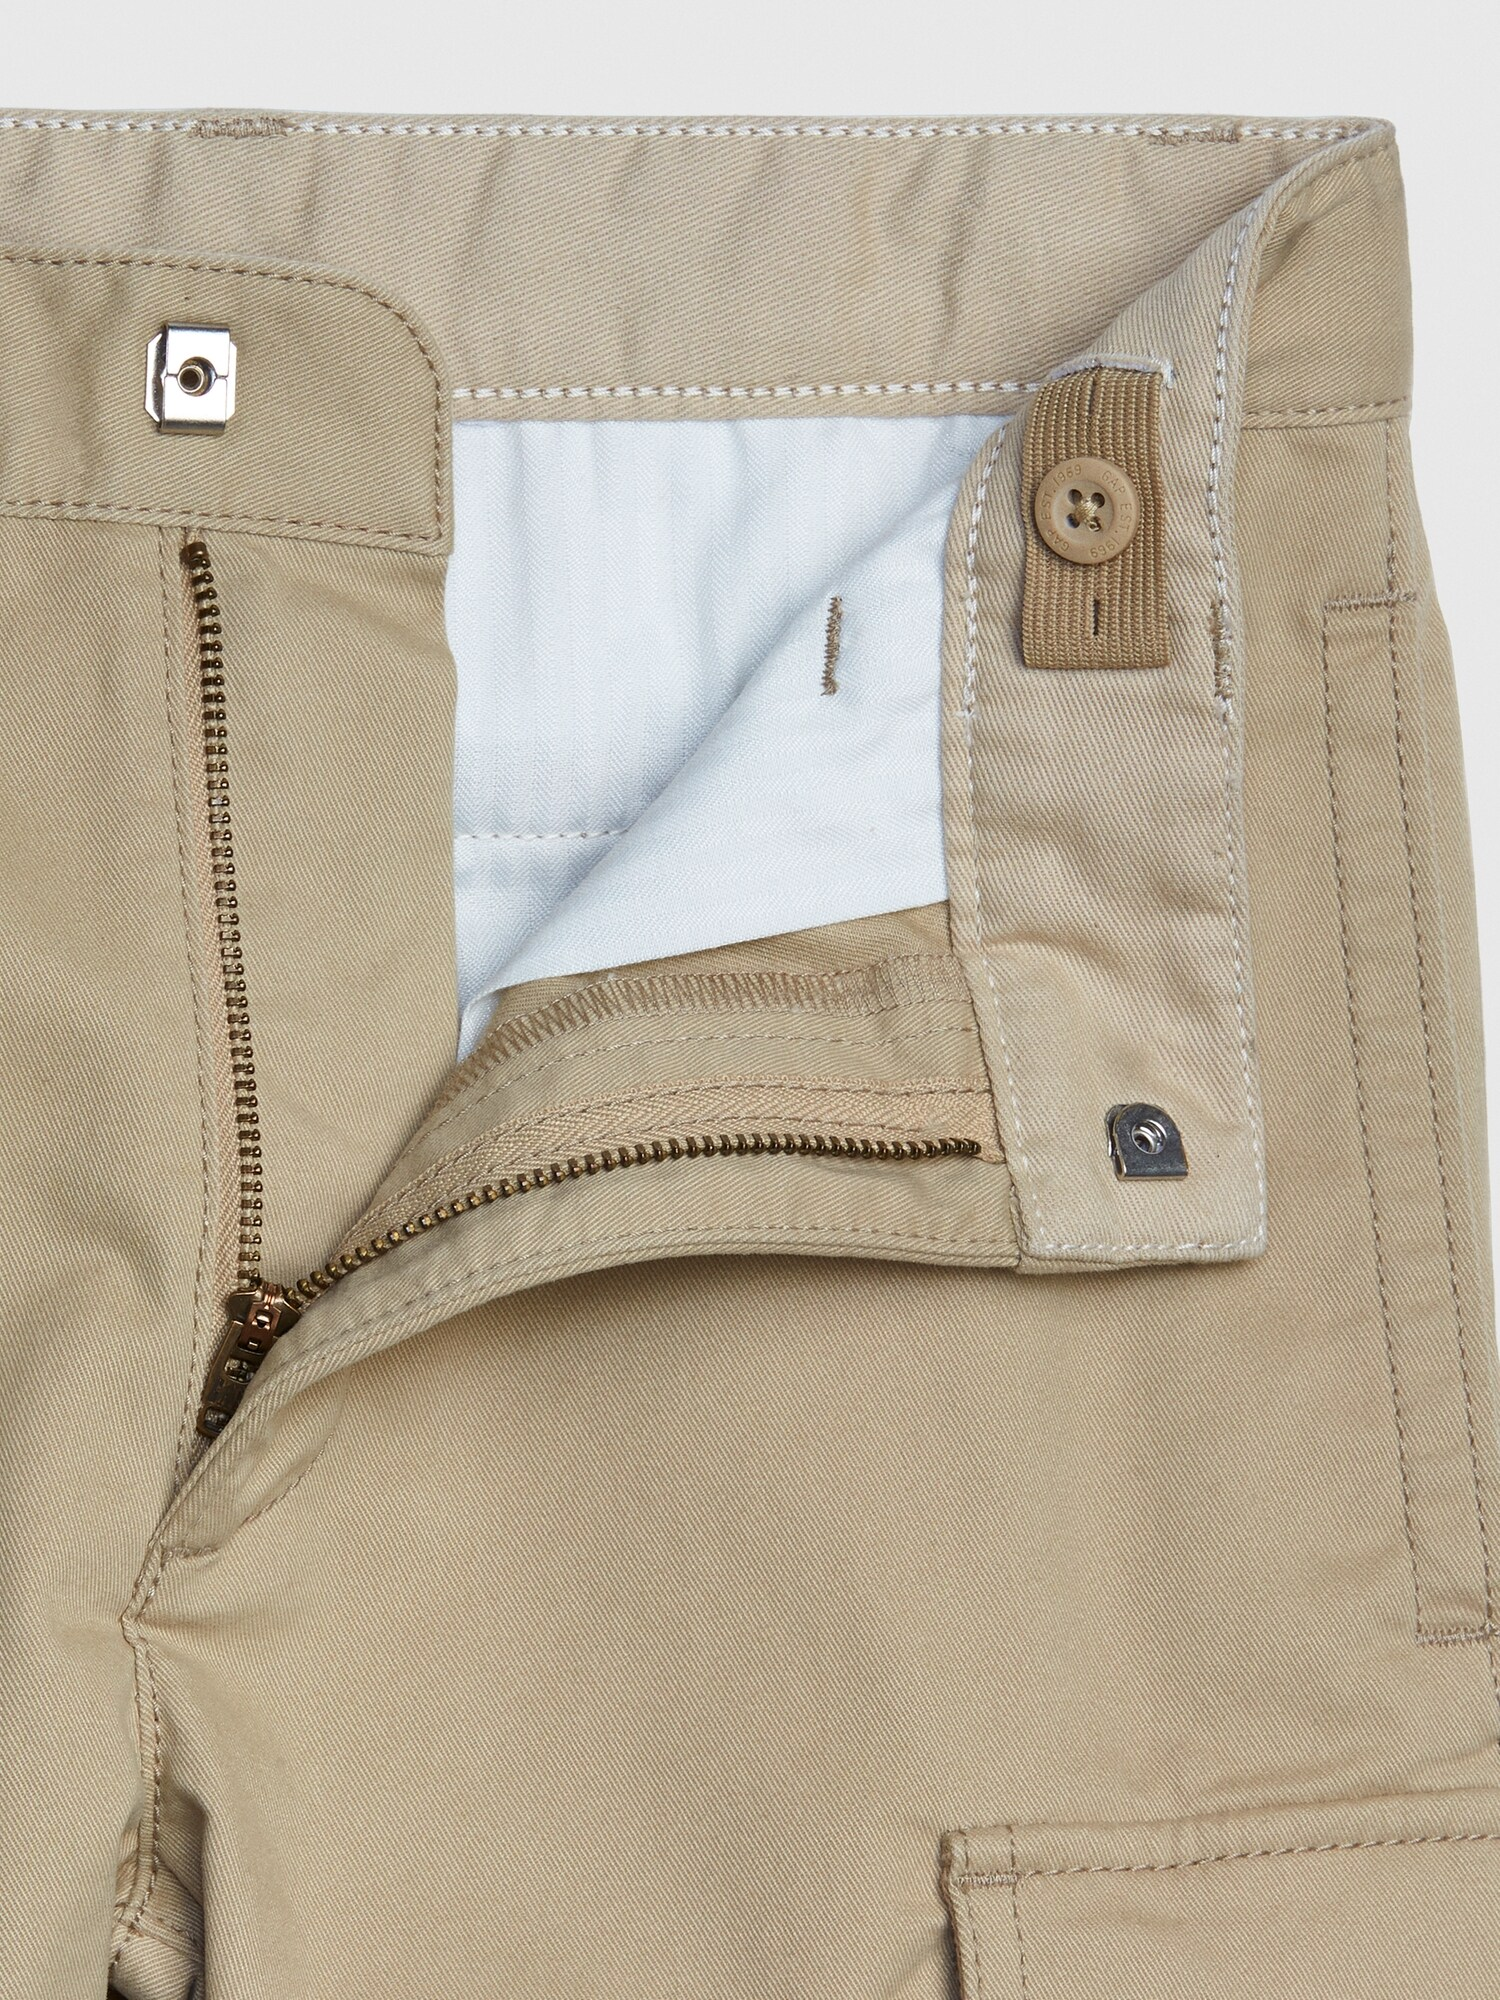 GAP Kids Factory Girls Khaki School Uniform Shorts 7